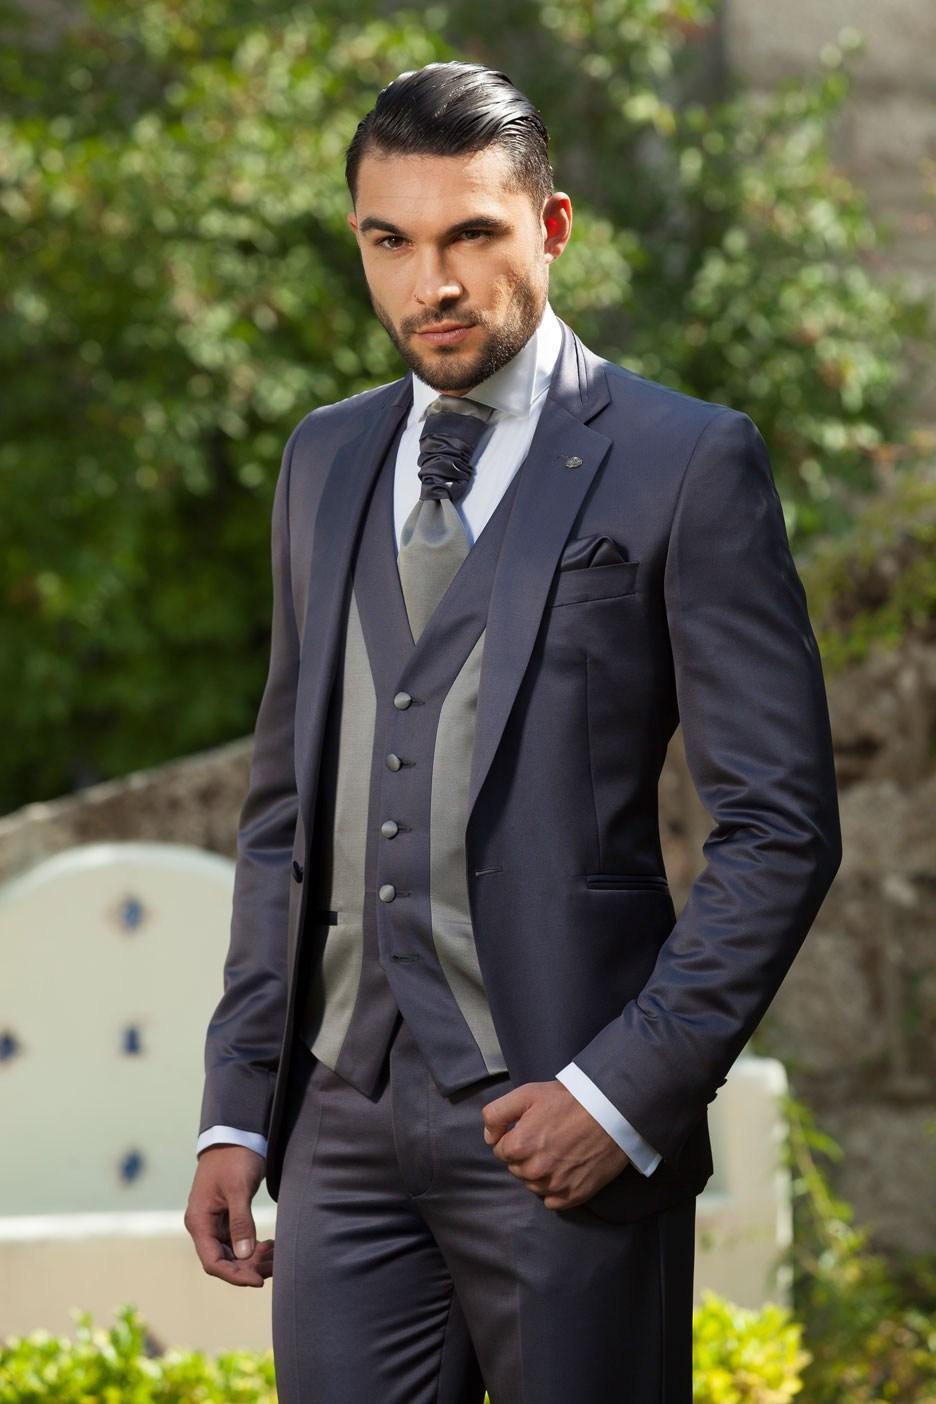 Slim Fit Customized Charcoal Wedding Ceremony Mens Suit Groom Tuxedos Bridegroom And Groomsman Suit Jacket+Pants+Tie+Vest